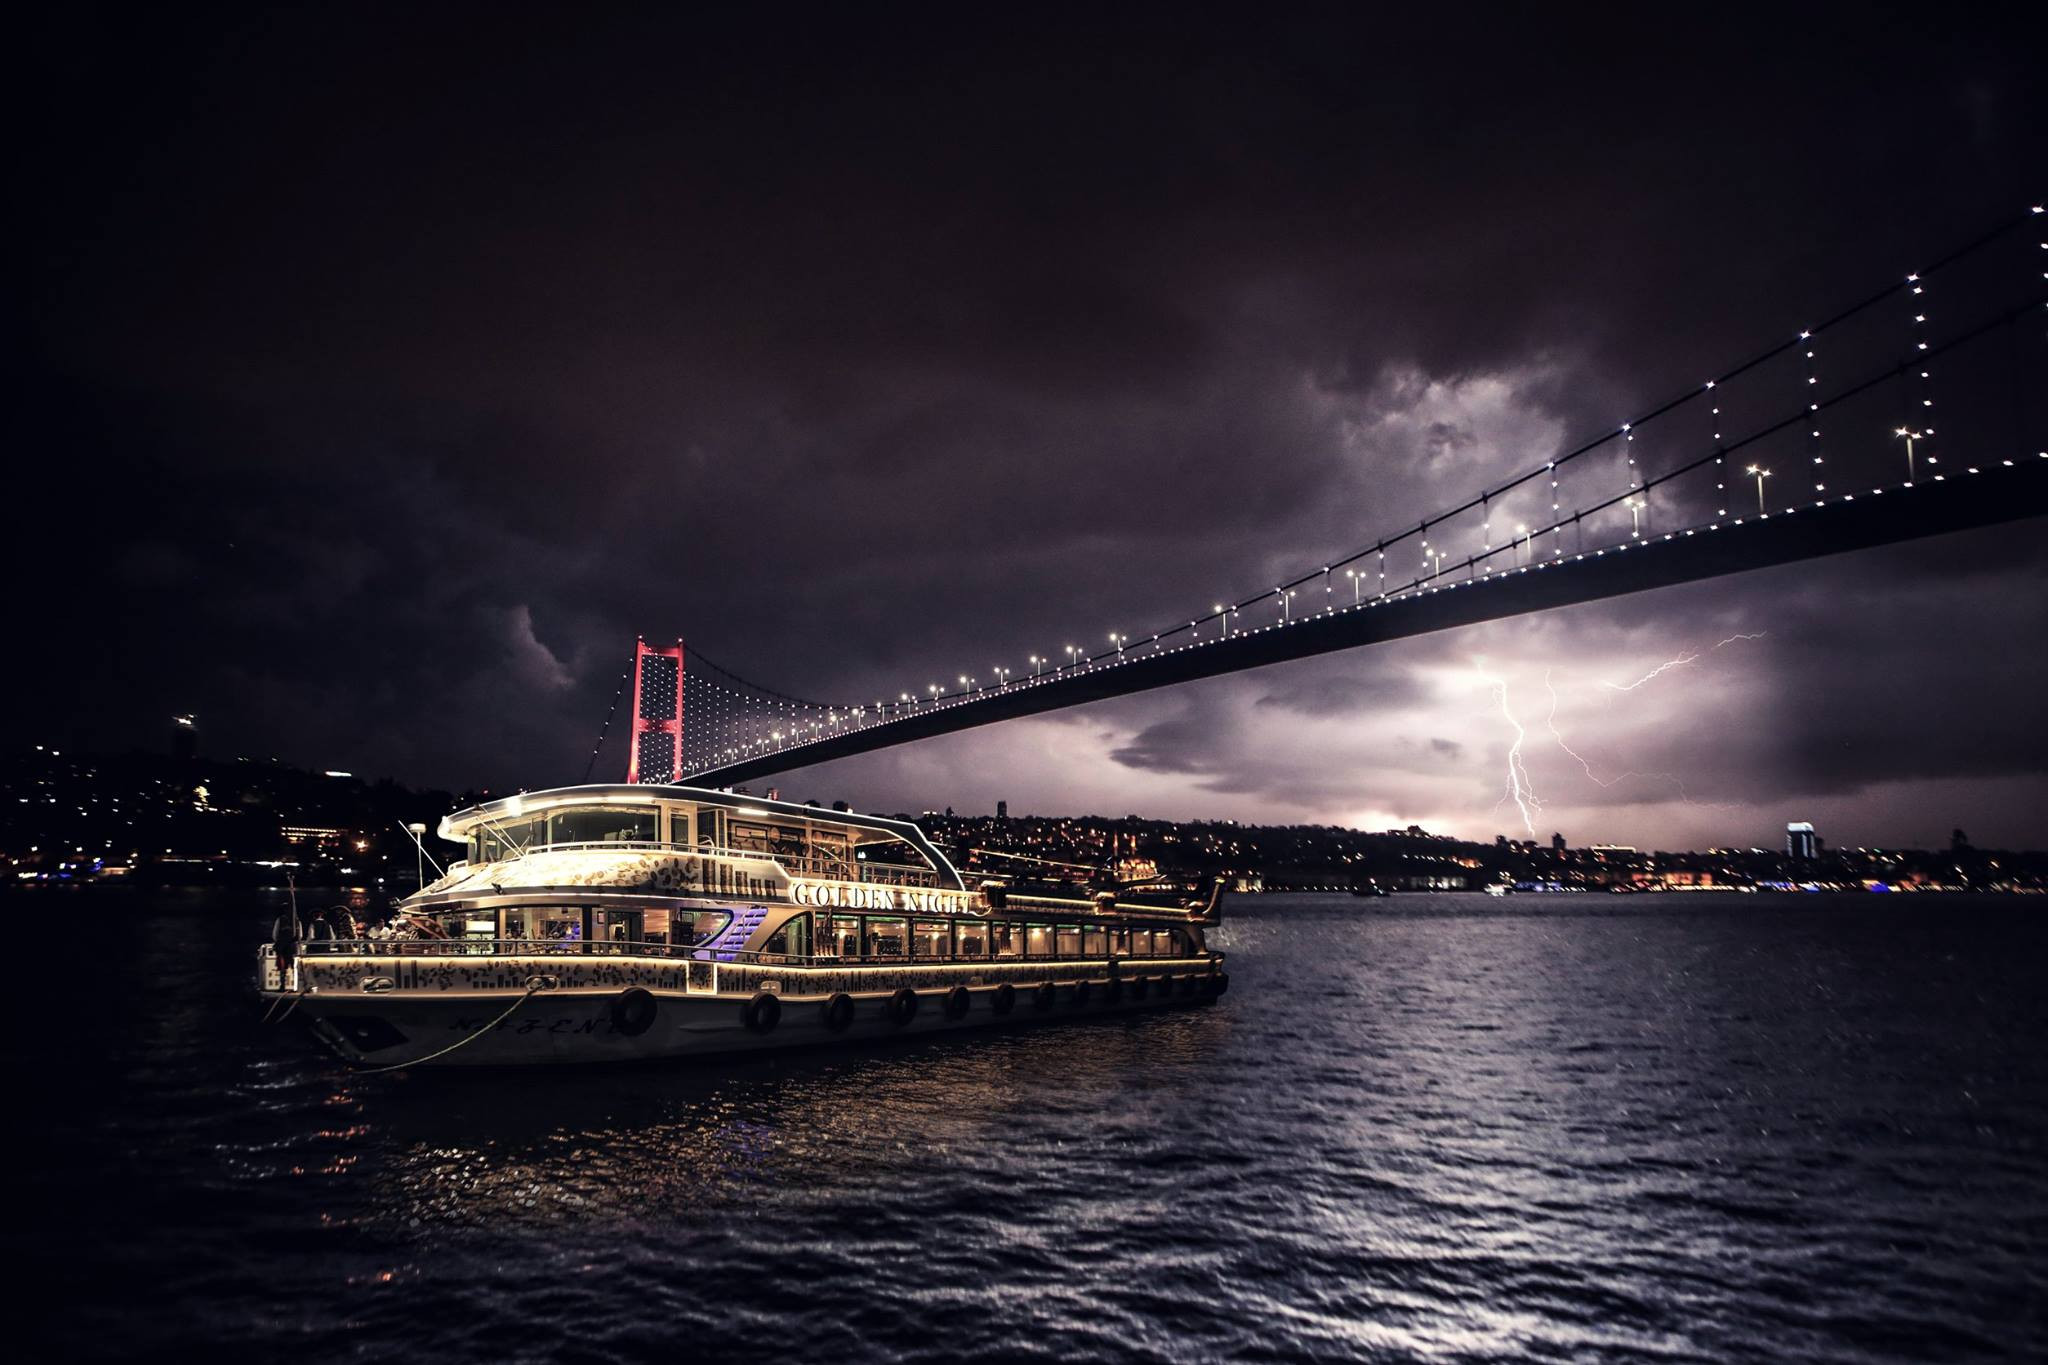 عرض خريف اسطنبول وطرابزون